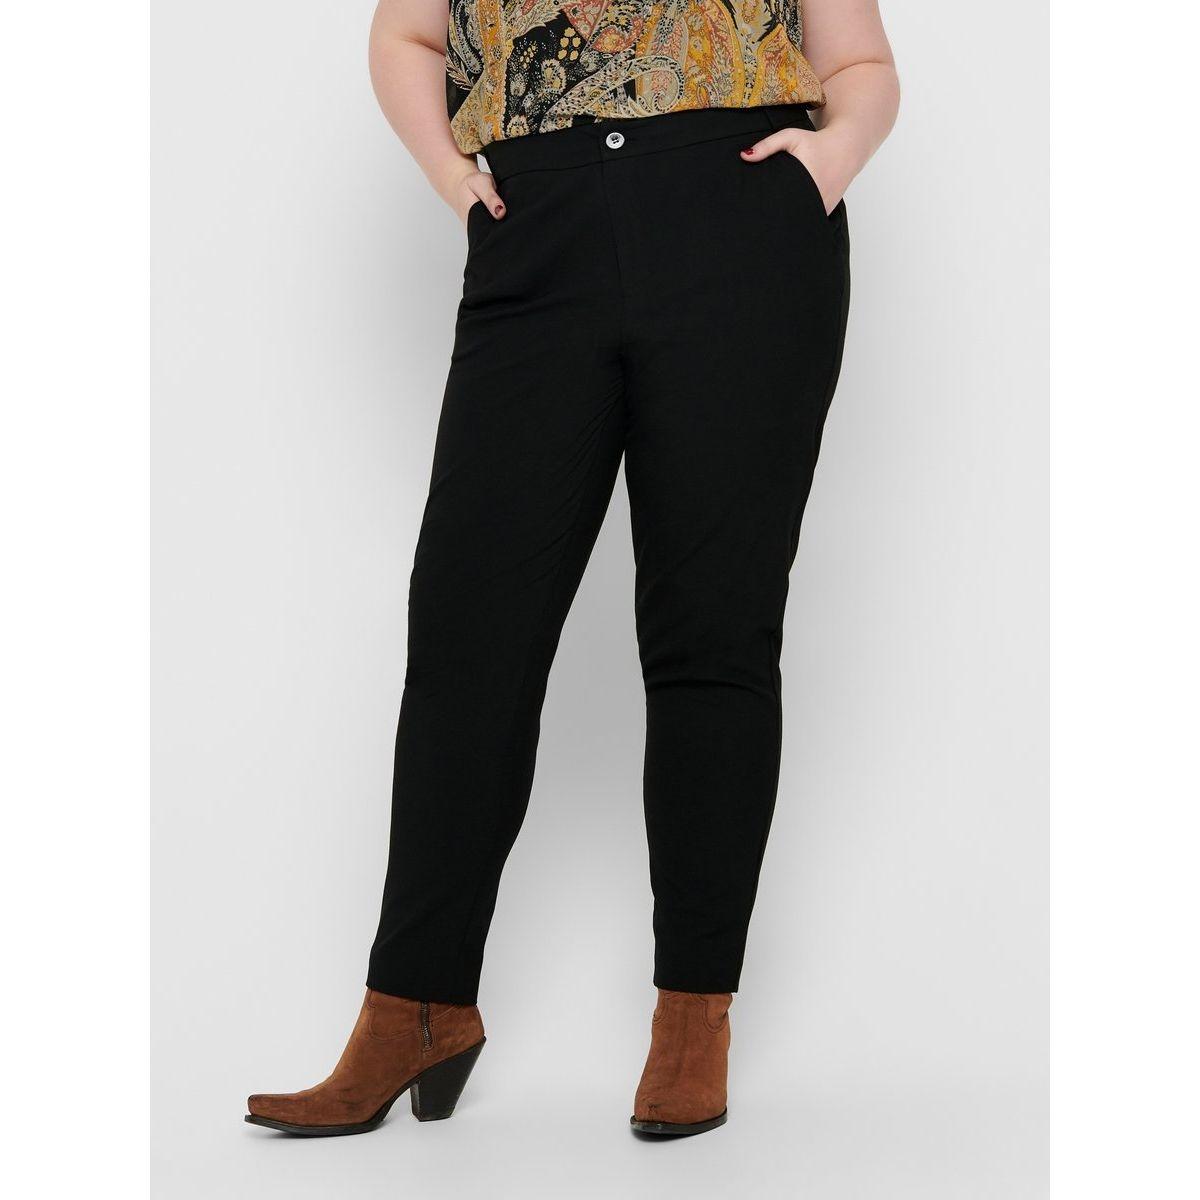 Pantalon Voluptueux uni